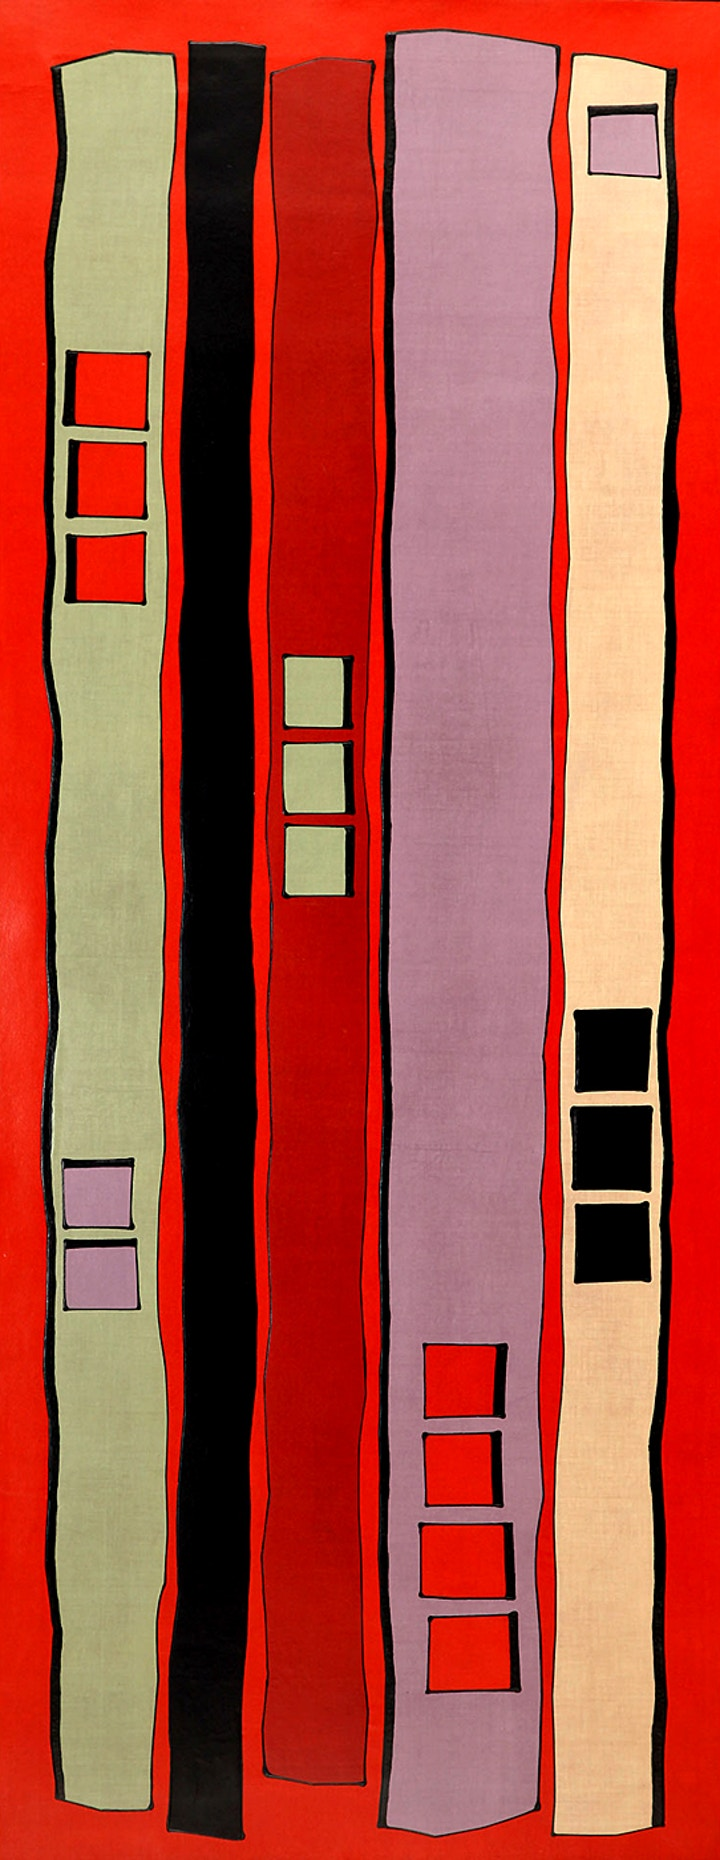 Sheree Sorrells with Ken Sorrells gallery 3 of 5